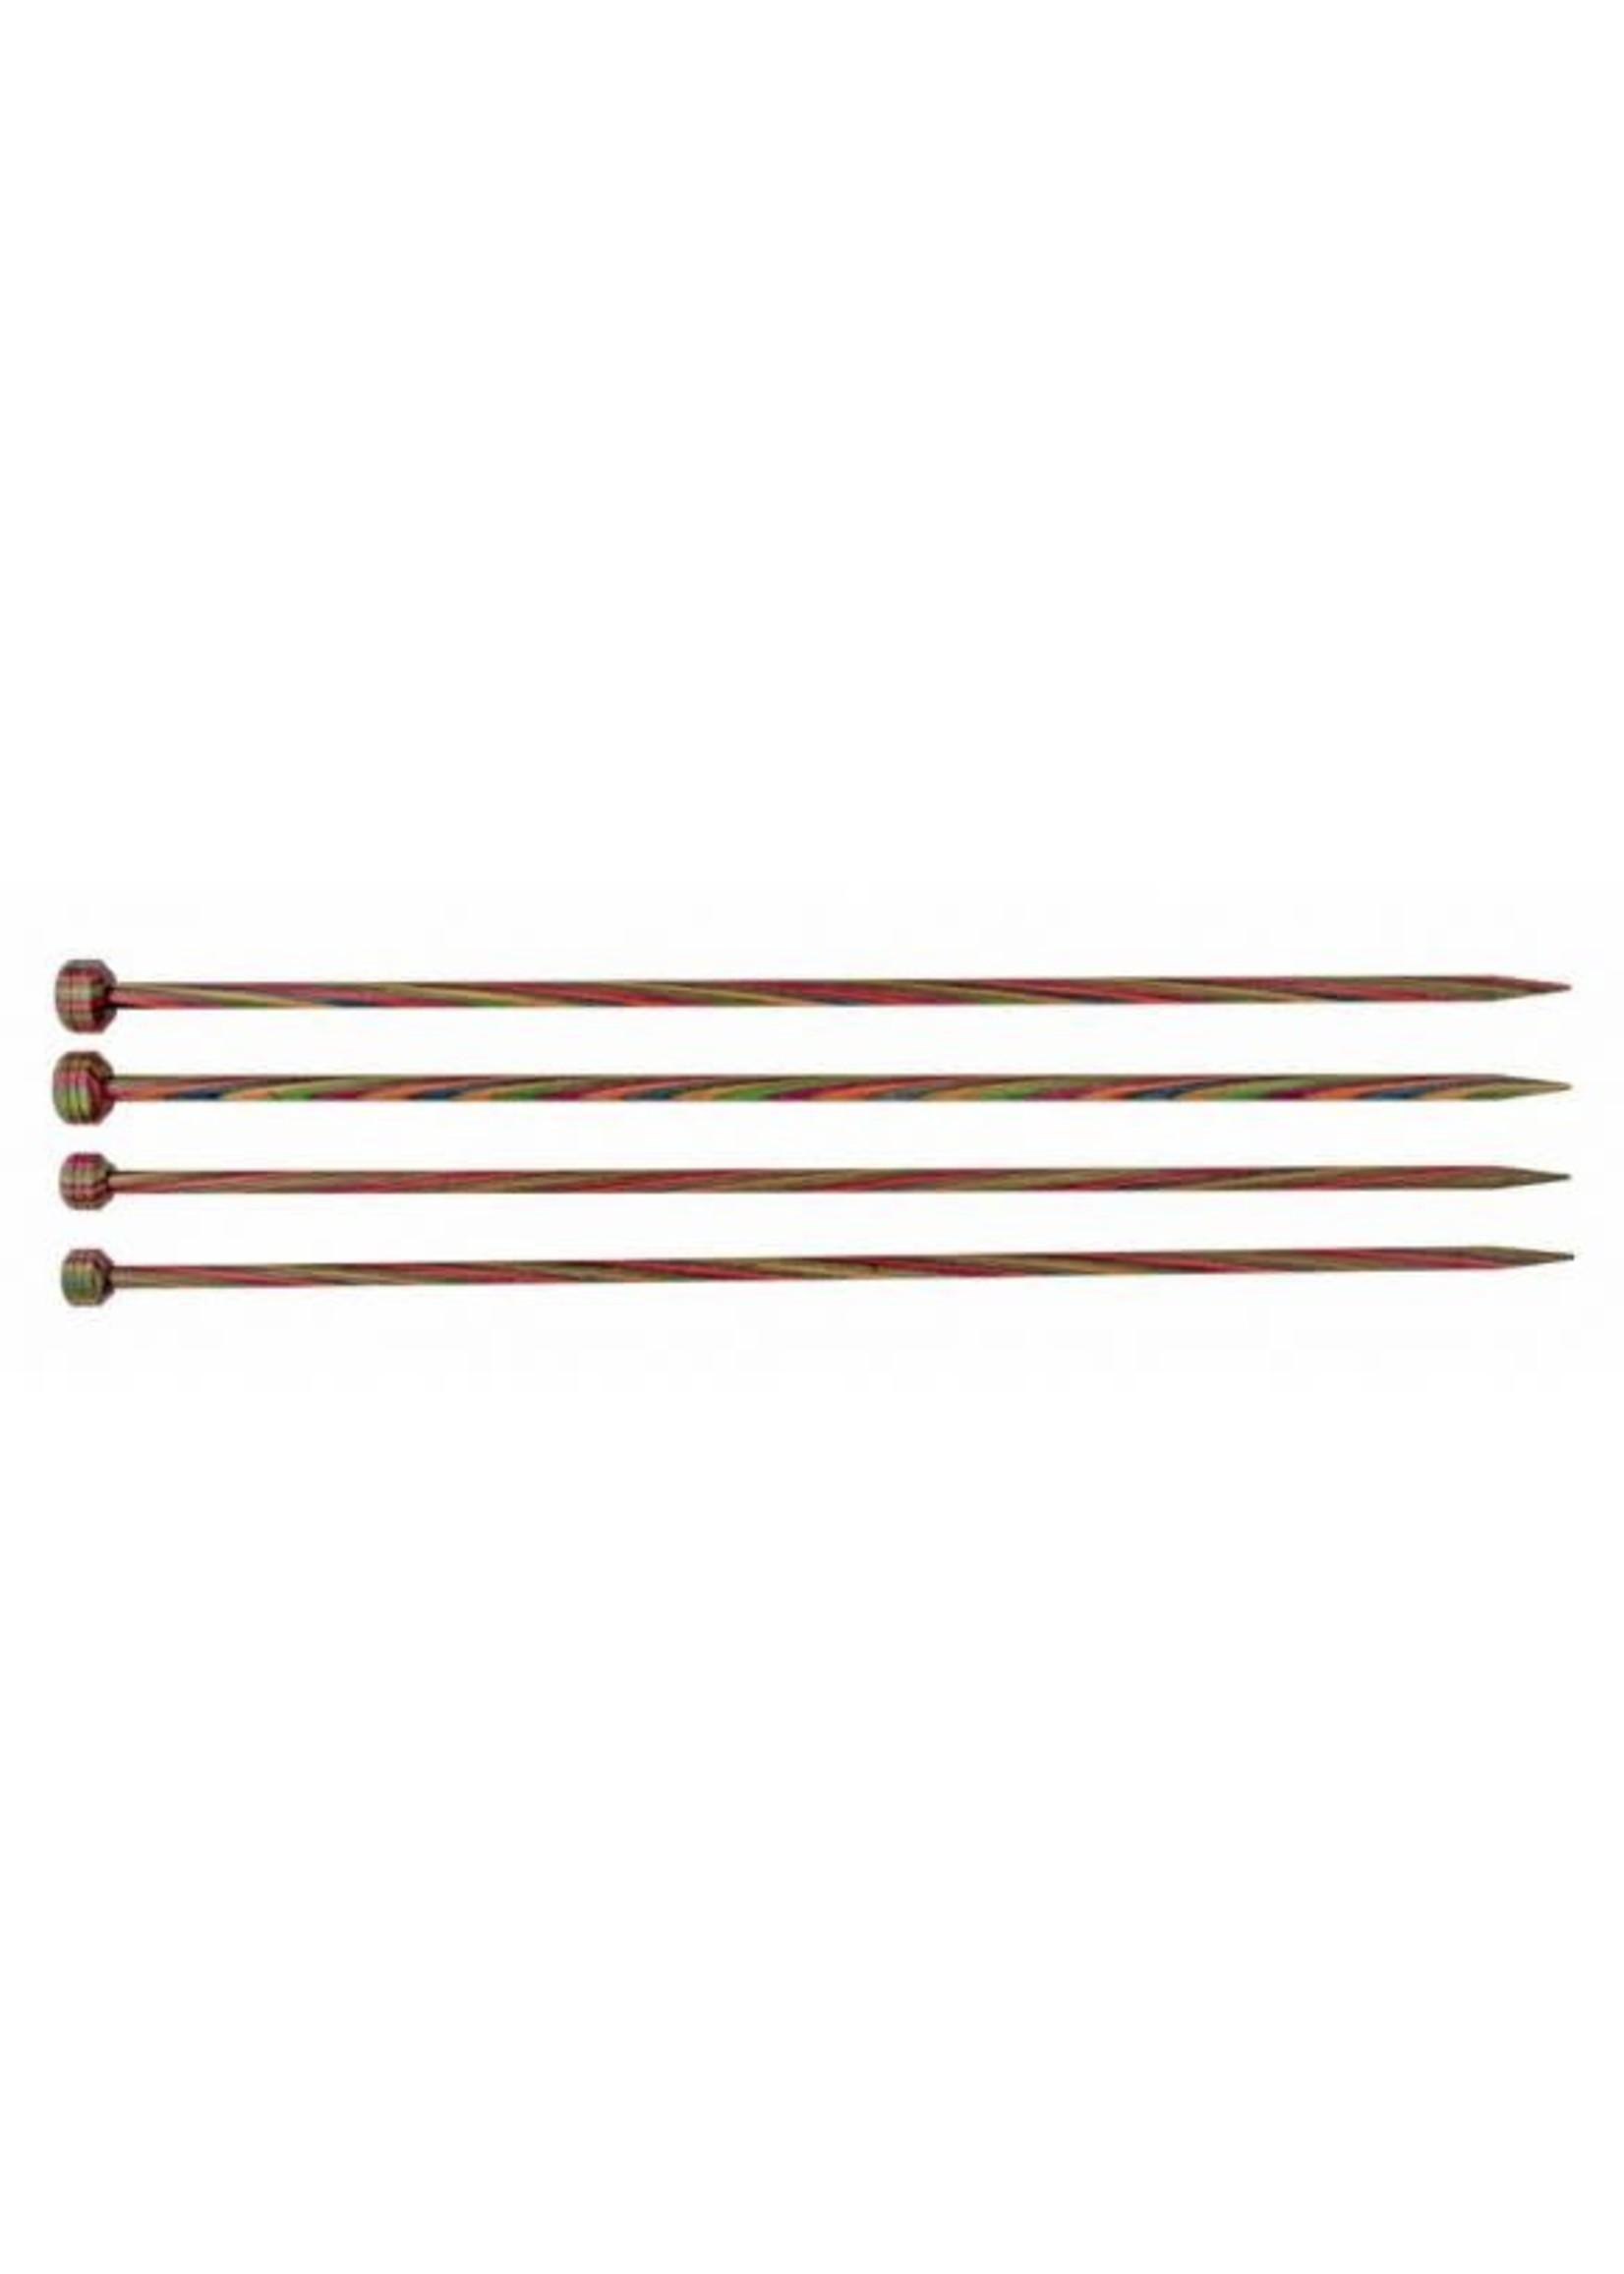 KnitPro KnitPro Symfonie Breinaalden 35cm met knop - 4.50mm